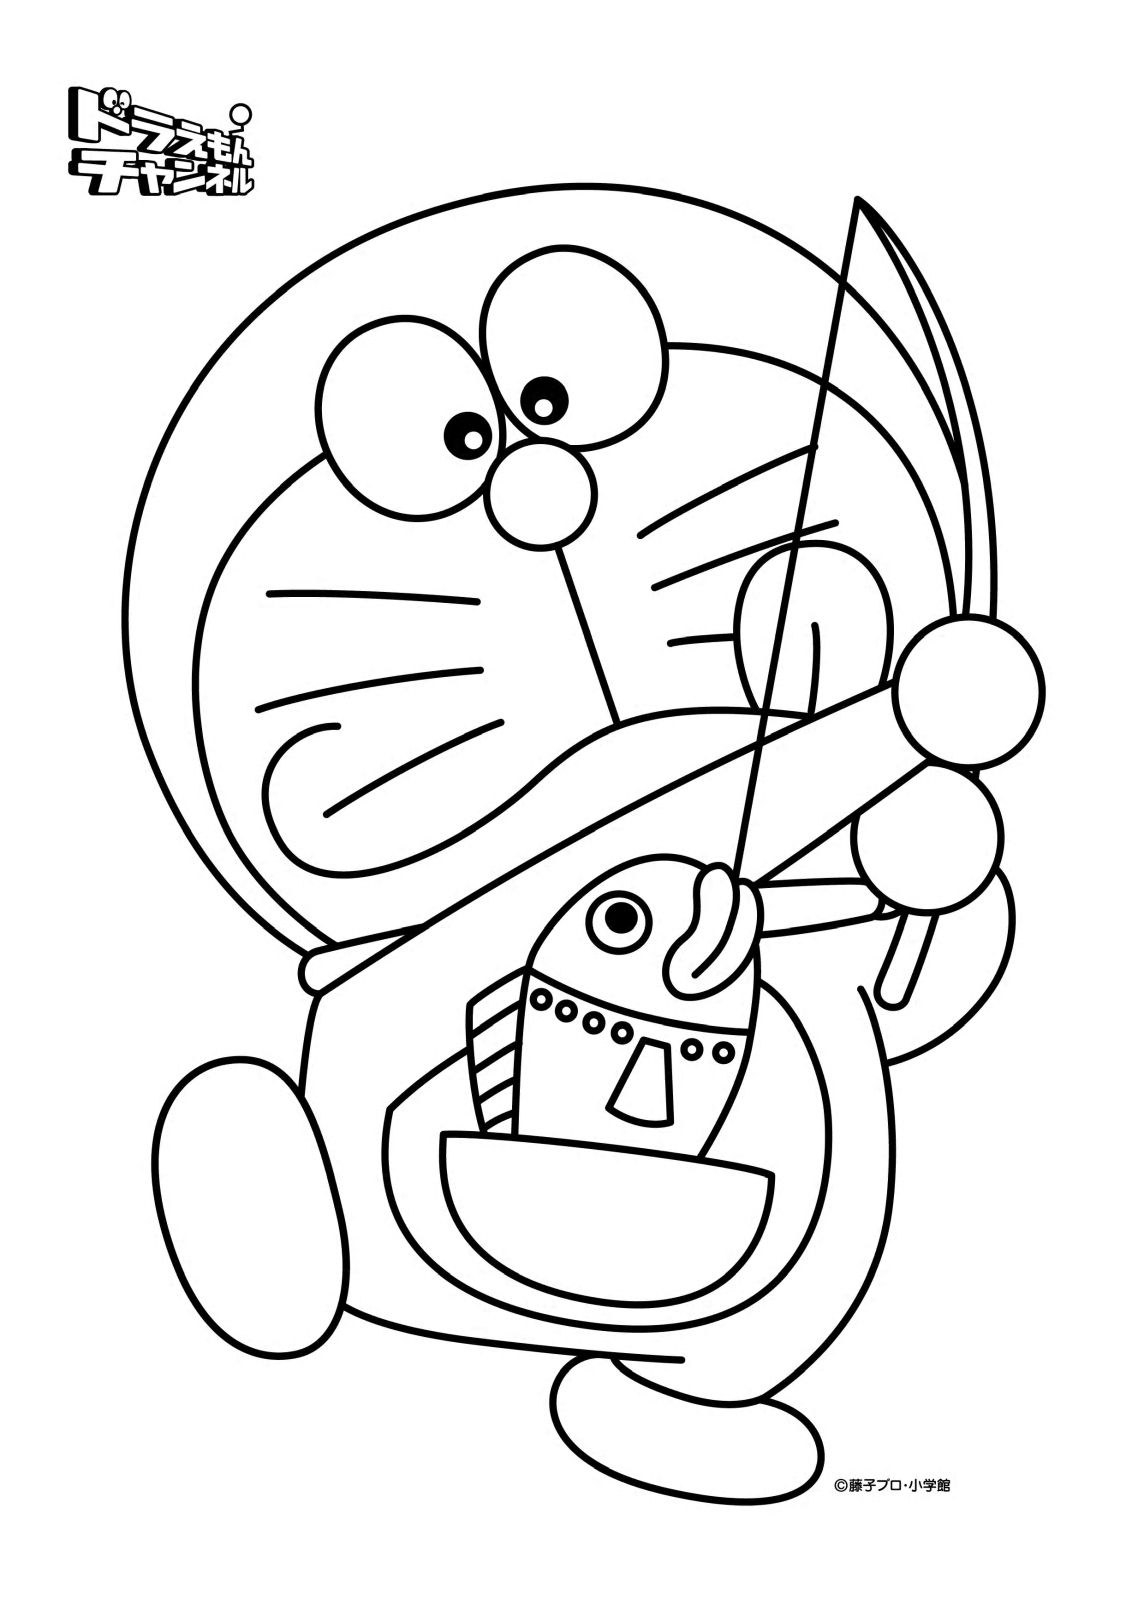 Doraemon Coloring Pages Free Large Images Cartoon Coloring Pages Coloring Books Coloring Book Download